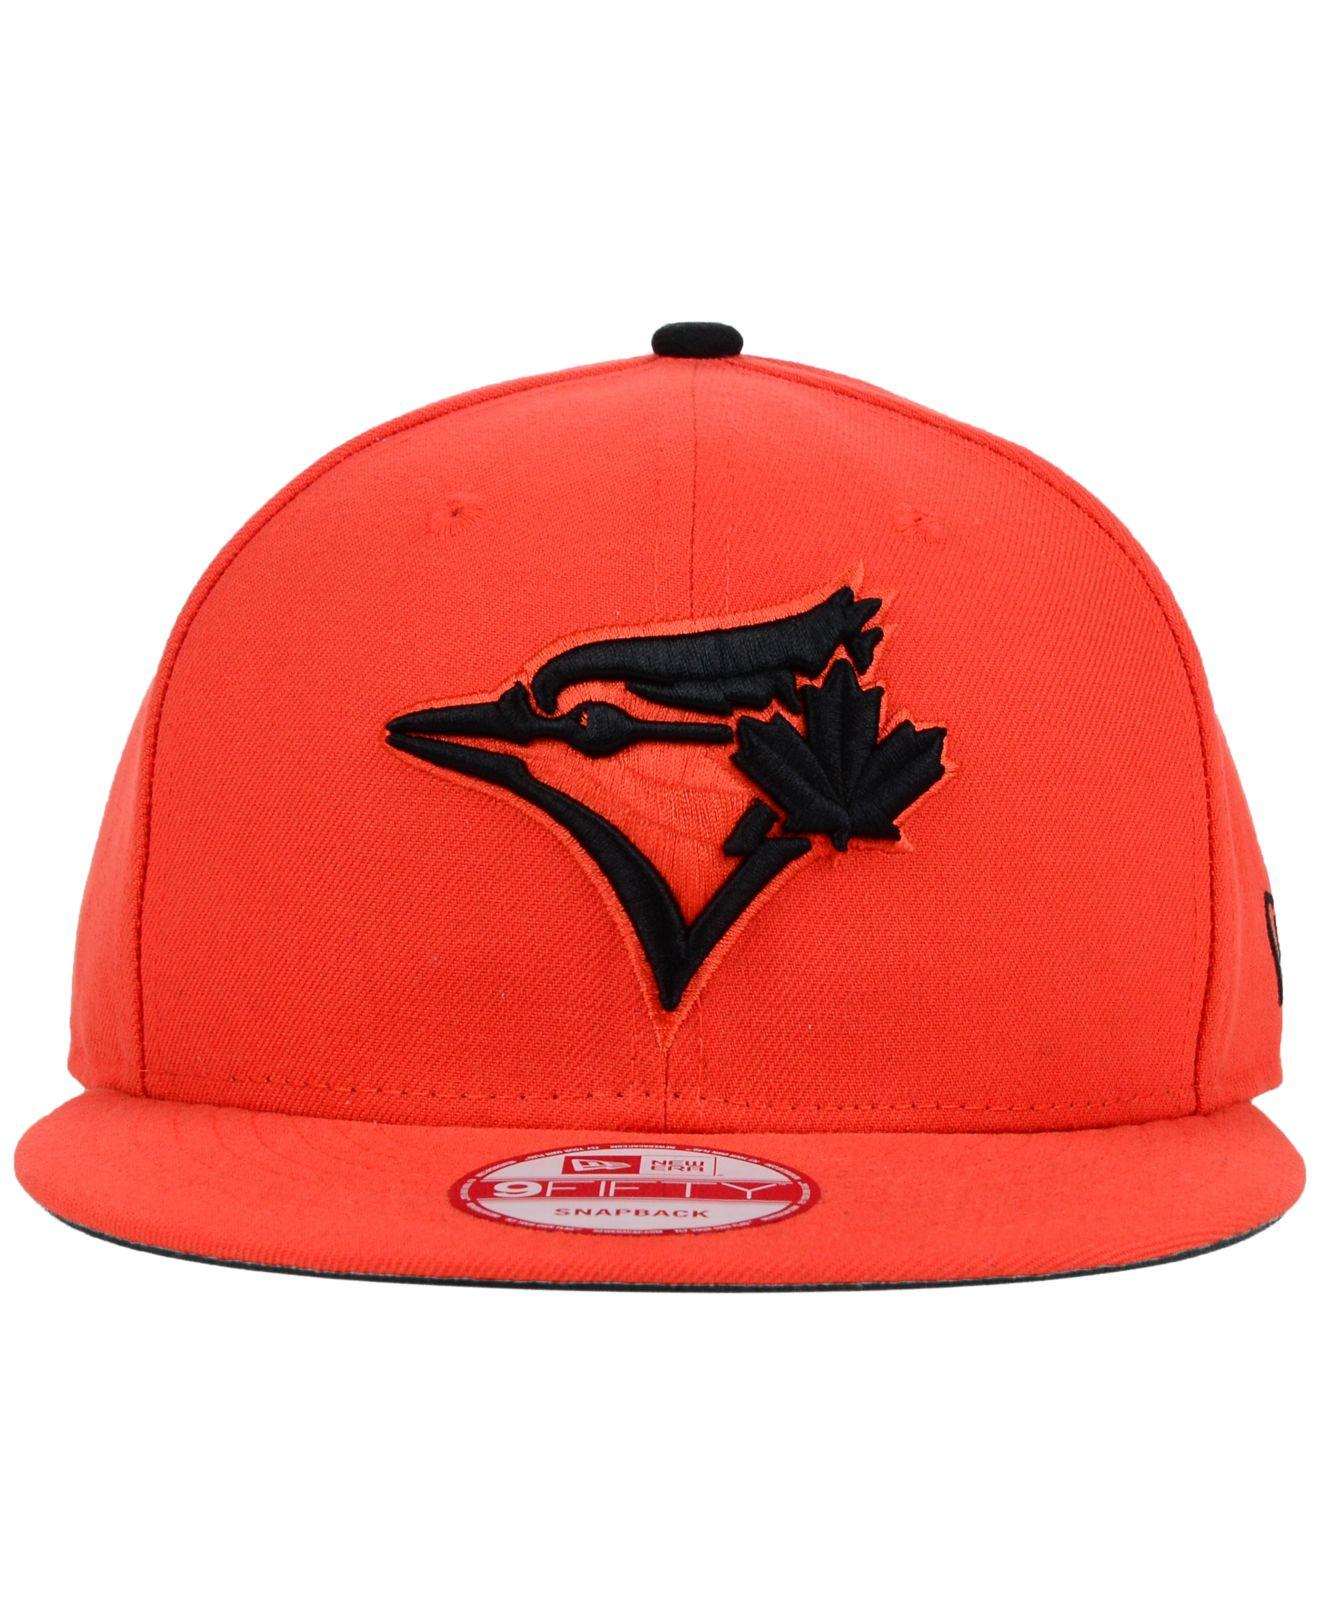 995f4852cbe ... order lyst ktz toronto blue jays snap dub 9fifty snapback cap in orange  c9081 40478